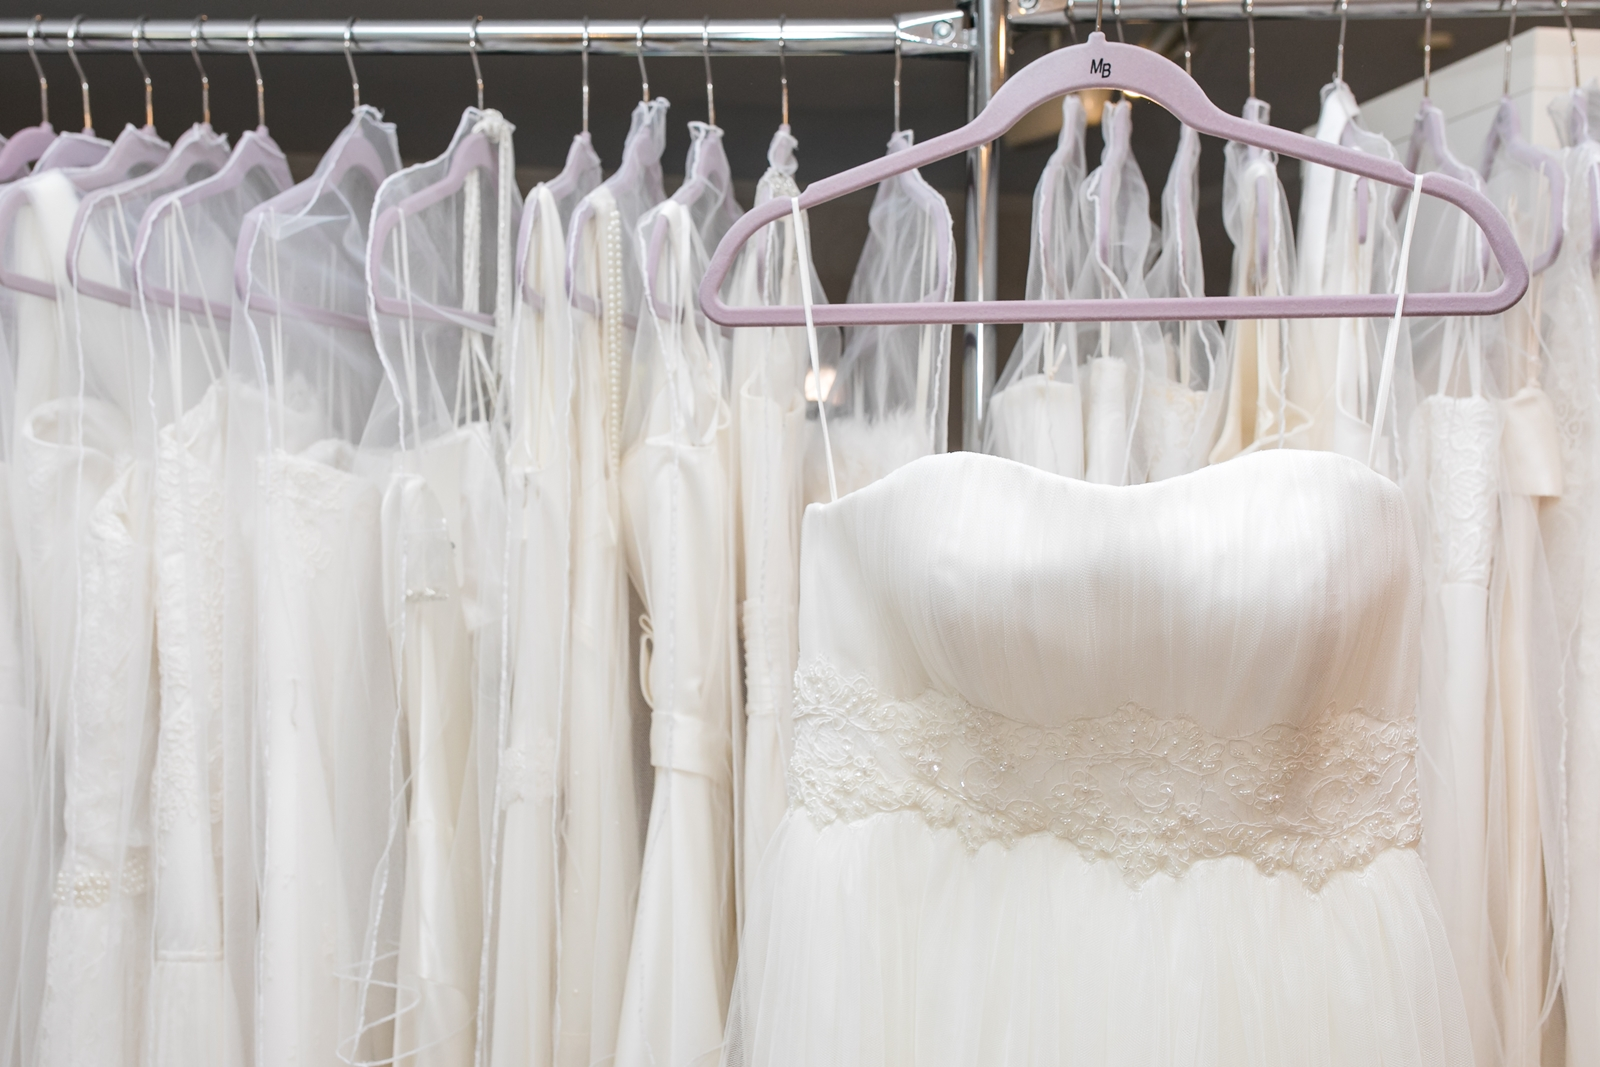 Bridal-Store-Brautkleider-Shop-Atelier-mona-berg-Brautkleider-Hamburg-Brautmode-vintage-boho-9